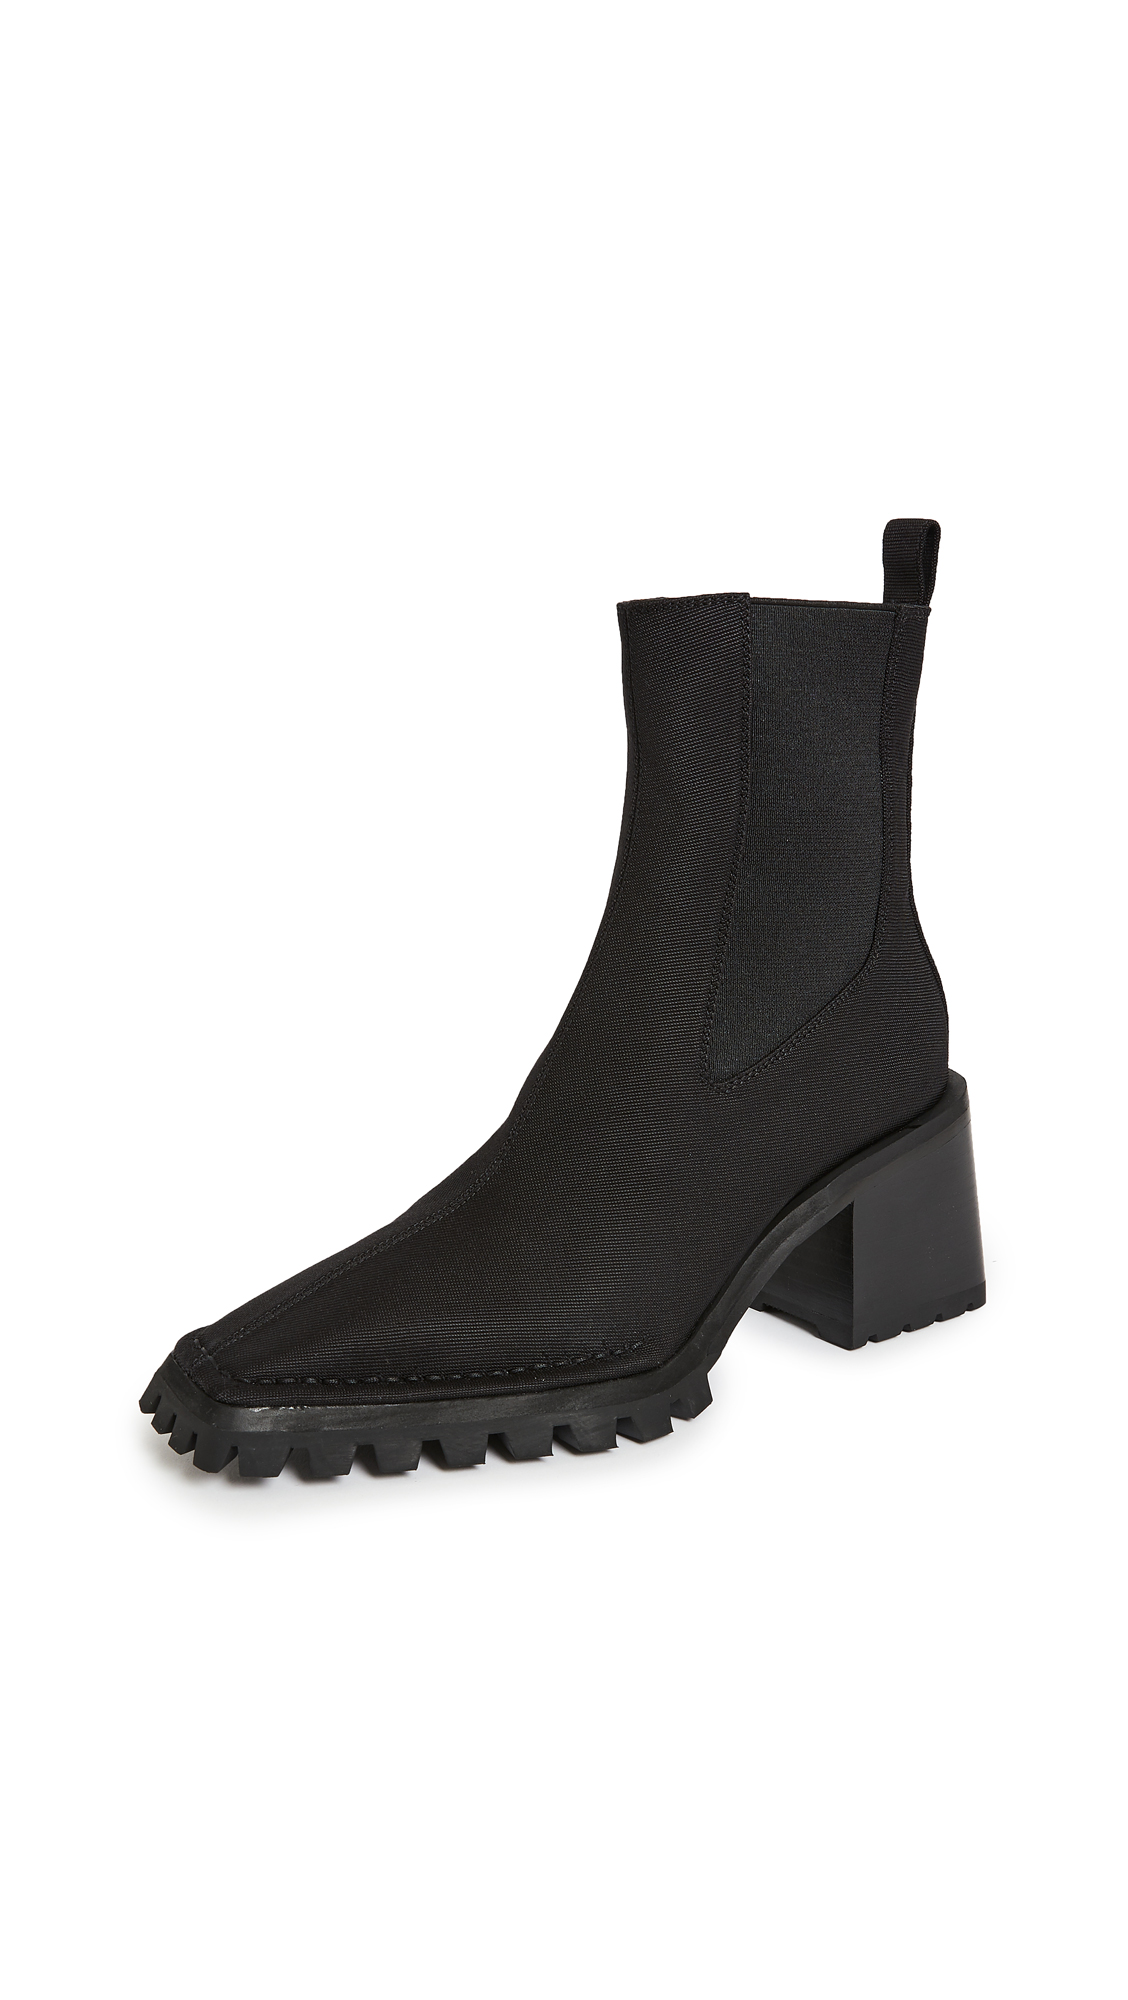 Alexander Wang Parker Lug Chelsea Boots